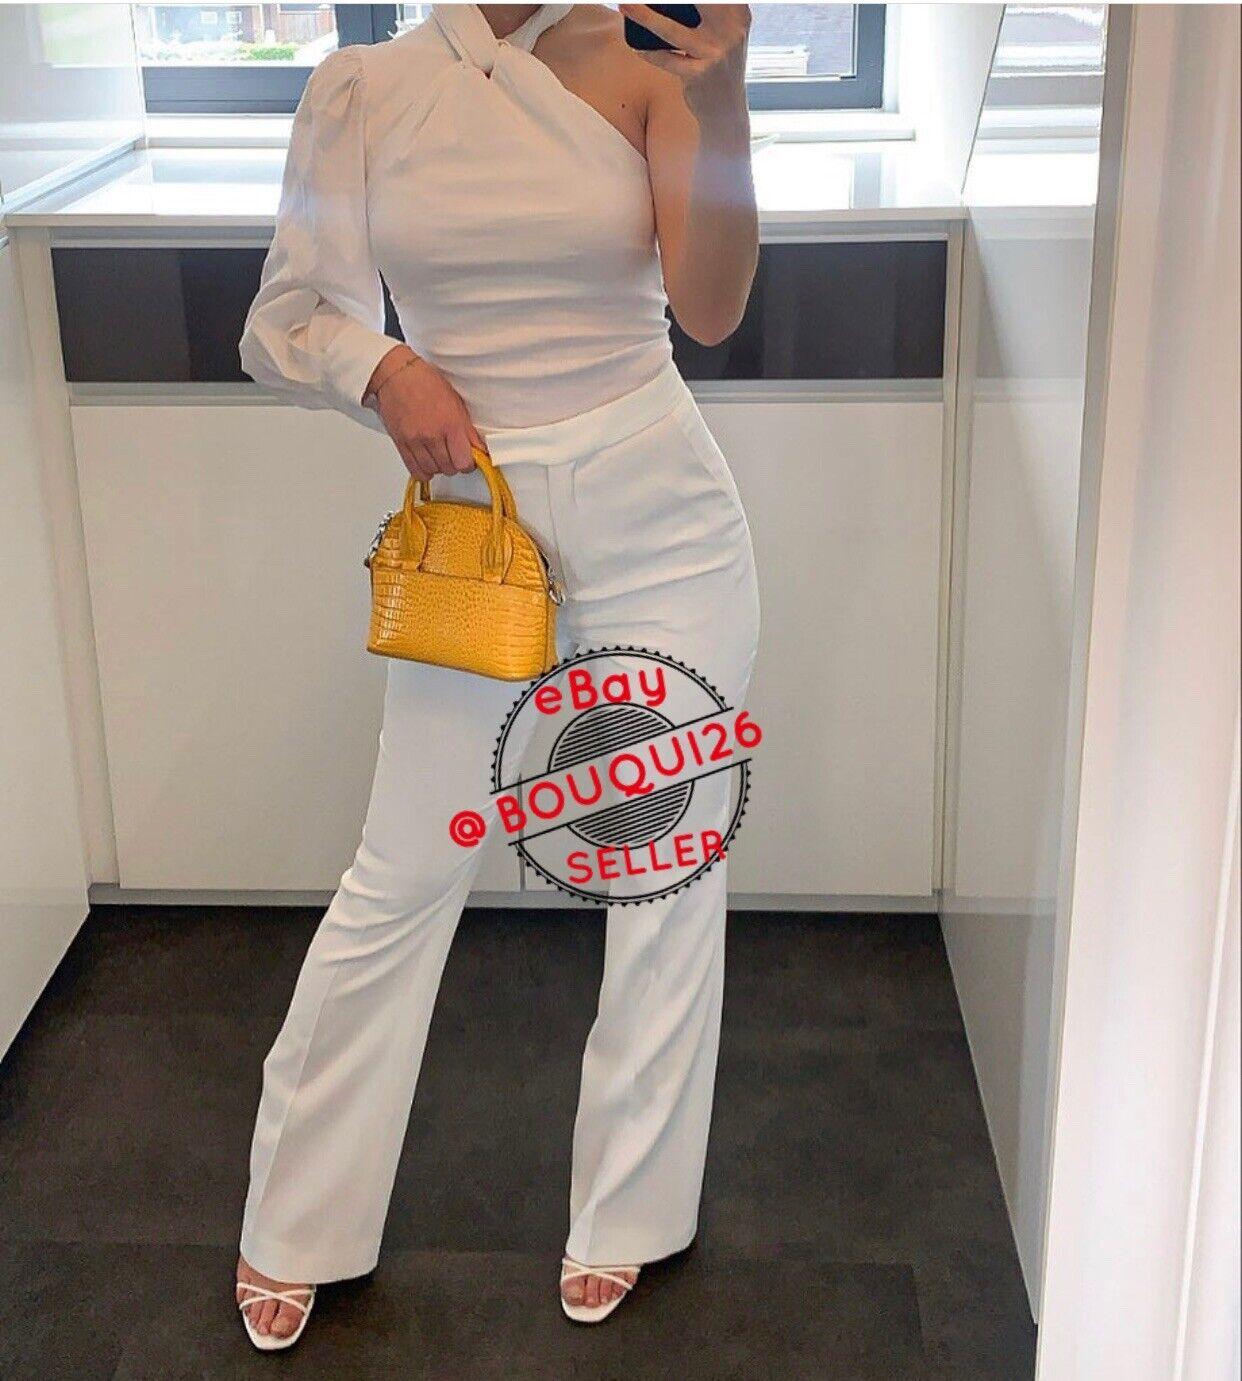 Metric Size C154 153018608500C154 Trousers Size 38//34 IN Cornflower Blue